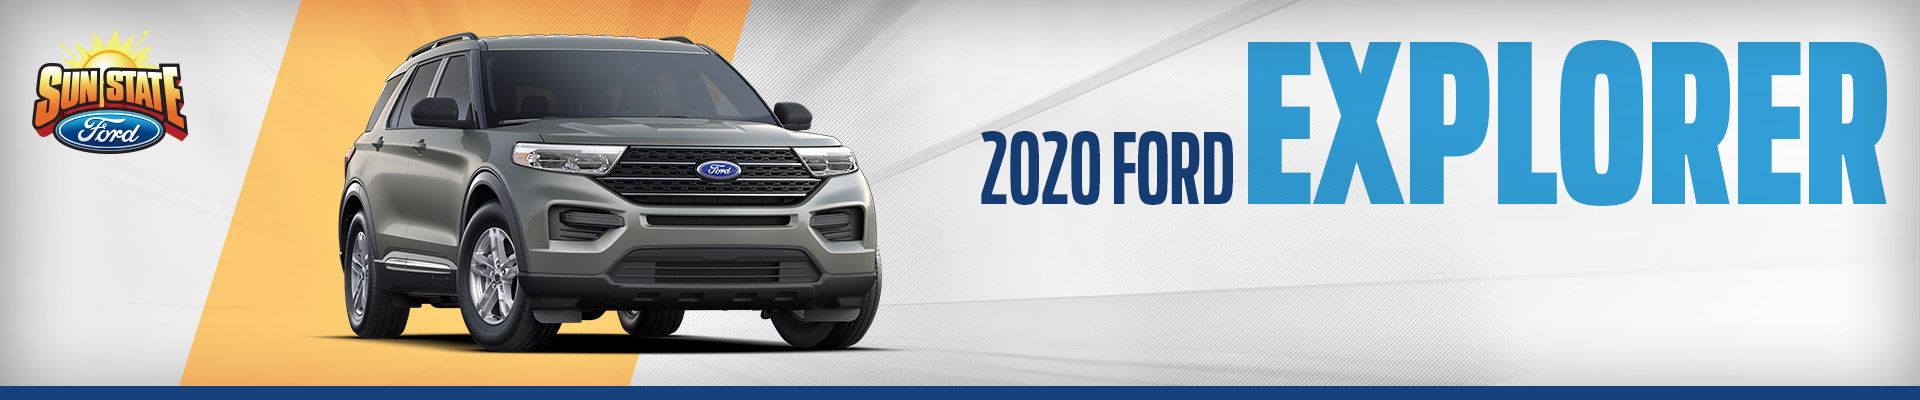 2020 Ford Explorer - Sun State Ford - Orlando, FL